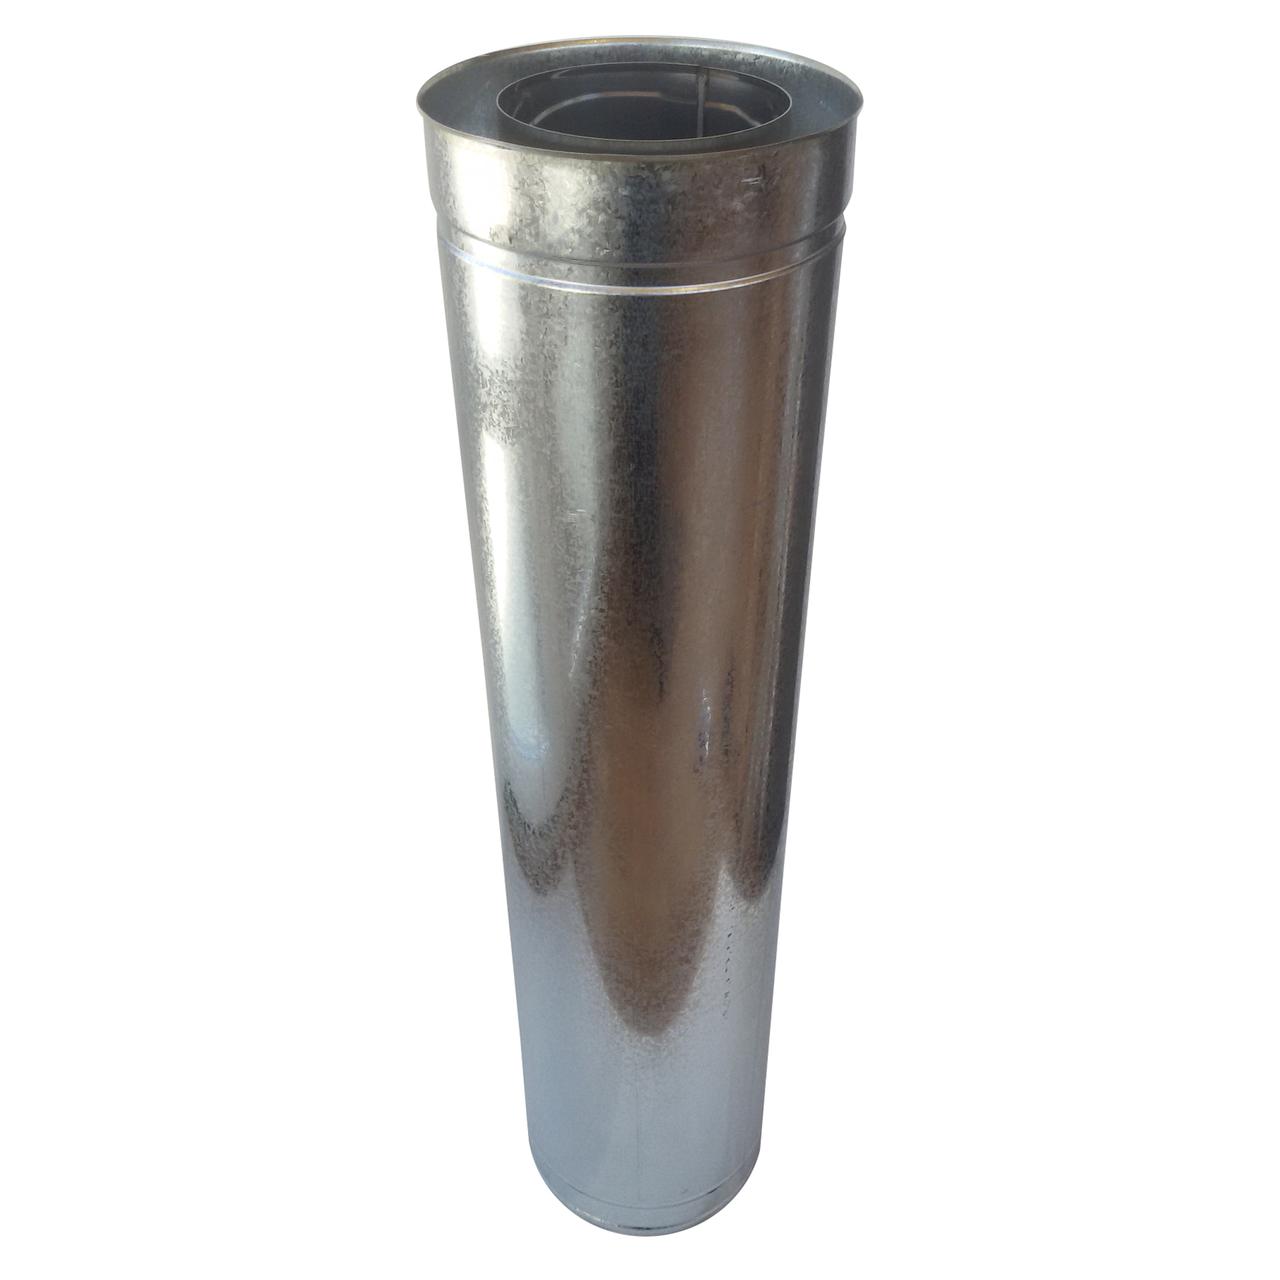 Труба-сэндвич для дымохода d 250 мм; 1 мм; AISI 304; 1 метр; нержавейка/оцинковка - «Версия-Люкс»